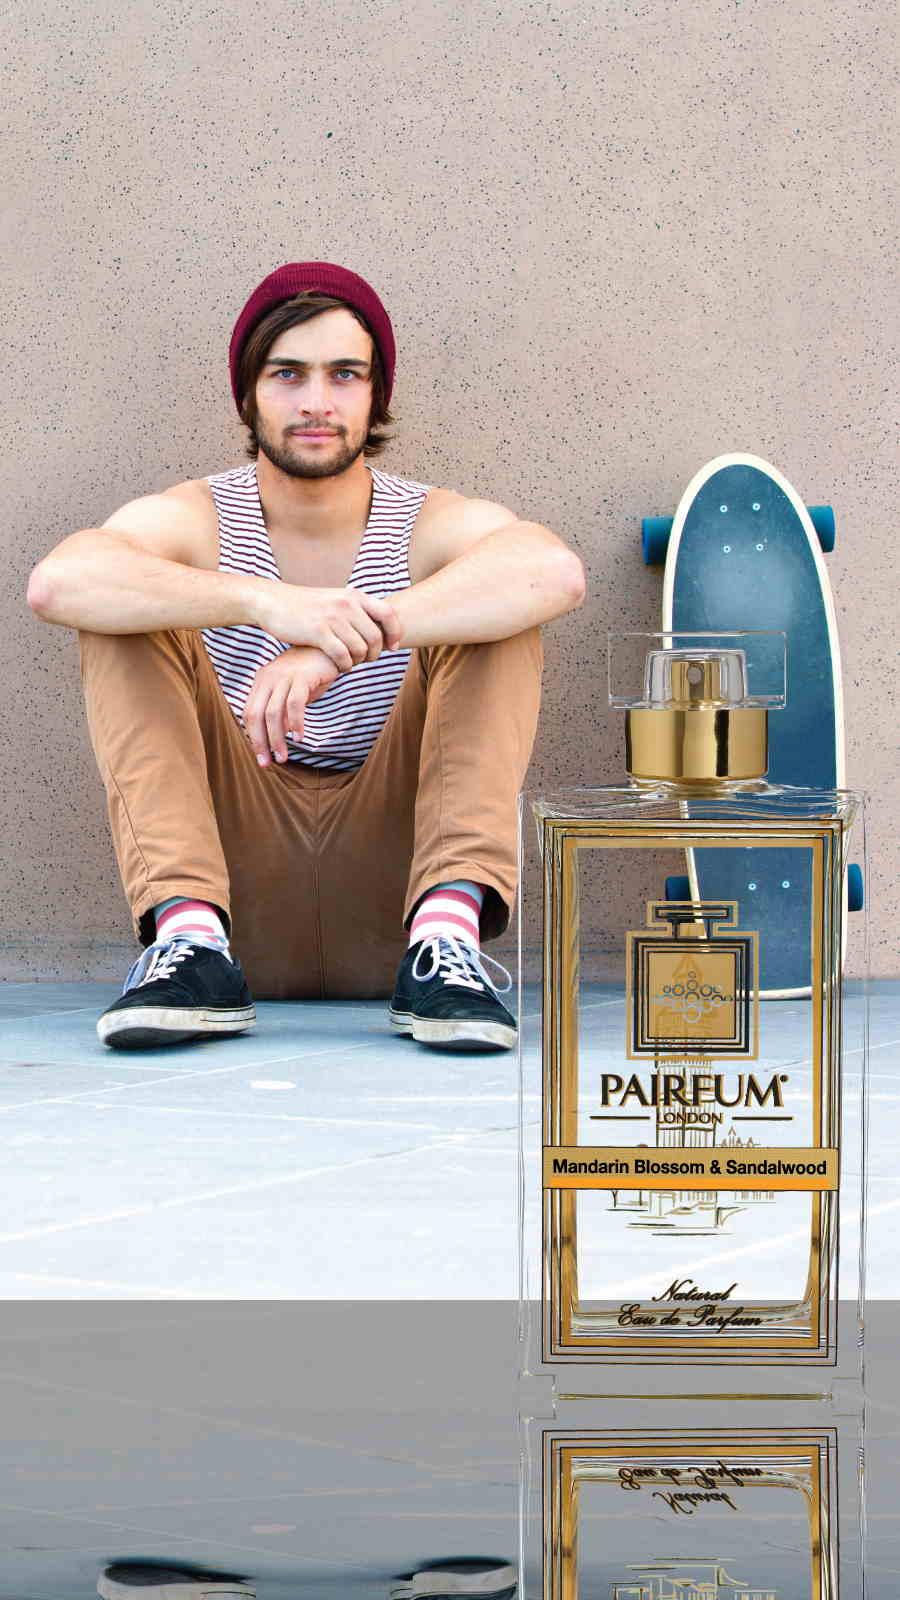 Eau De Parfum Person Reflection Mandarin Blossom Sandalwood Scateboard 9 16